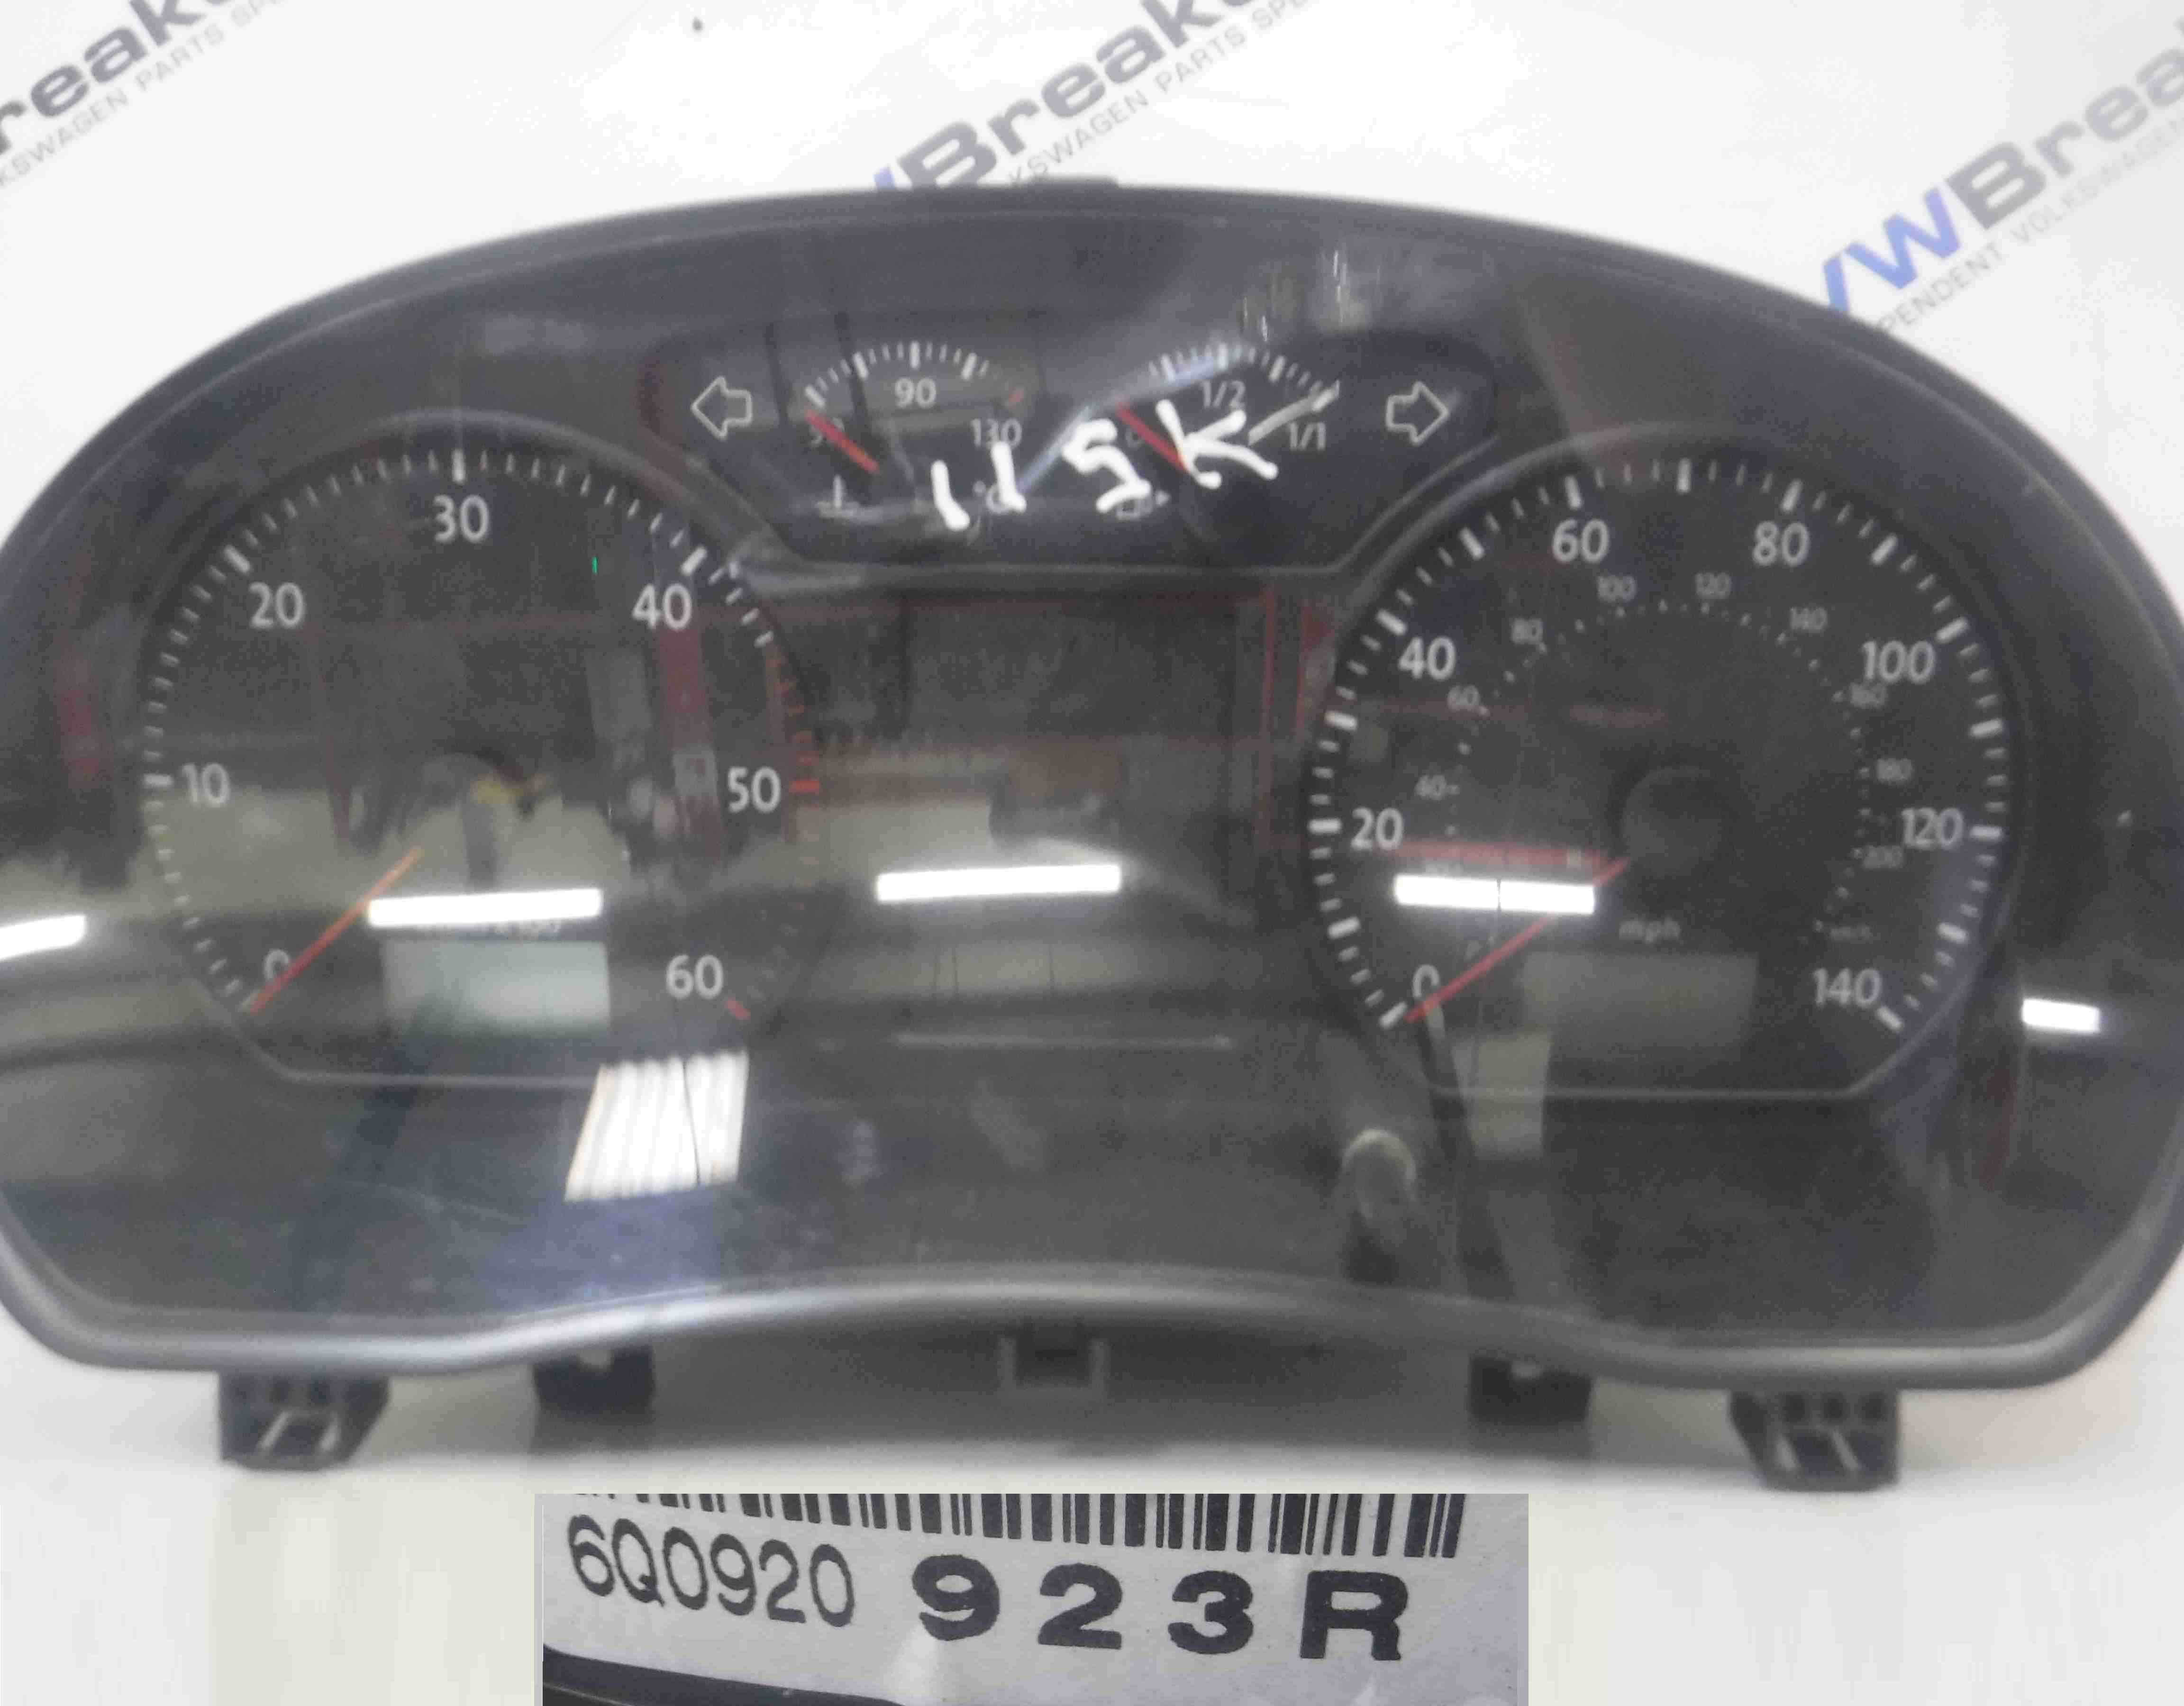 Volkswagen Polo 9N3 2006-2008 Instrument Panel Clocks Cluster 113K  6Q0920923R